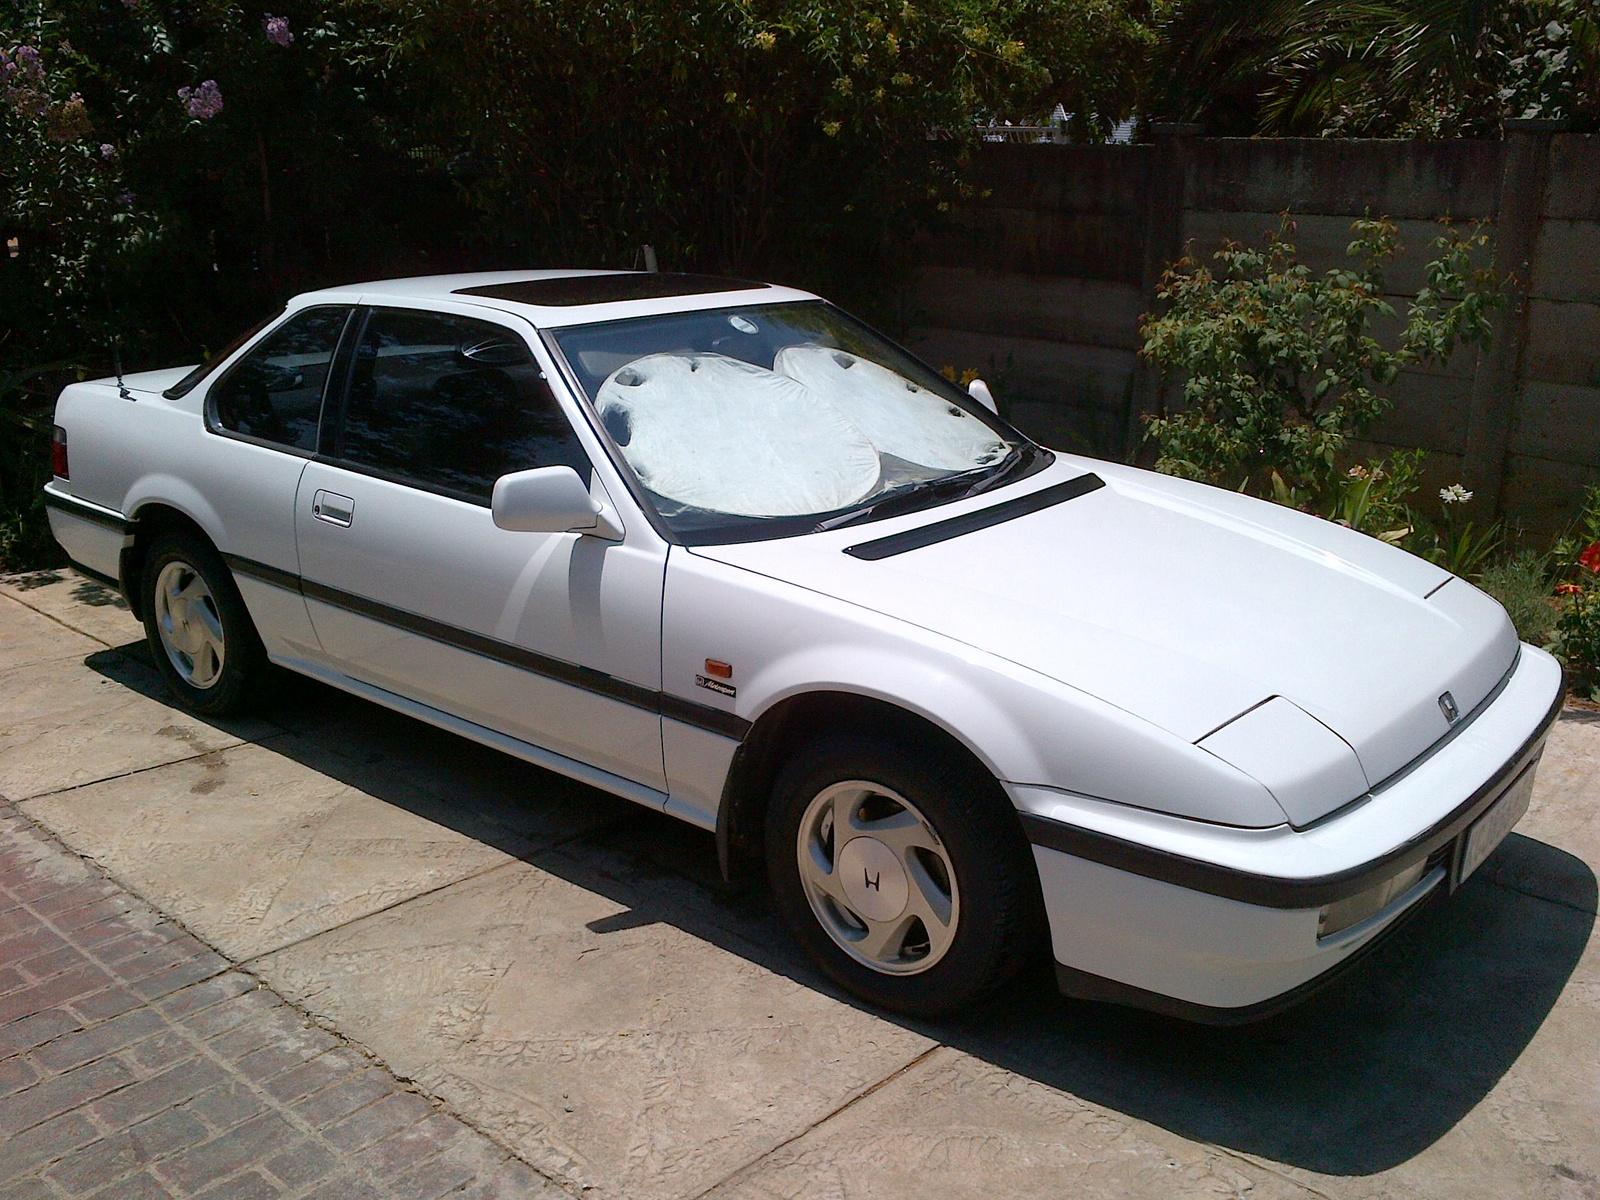 1991_honda_prelude_2_dr_2_0_si_coupe pic 4470467678404236330?interpolation=lanczos noneu0026output quality=85u0026downsize=590 441 honda 1987 honda civic crx 19s 20s car and autos, all makes 1987 Honda CRX HF at edmiracle.co